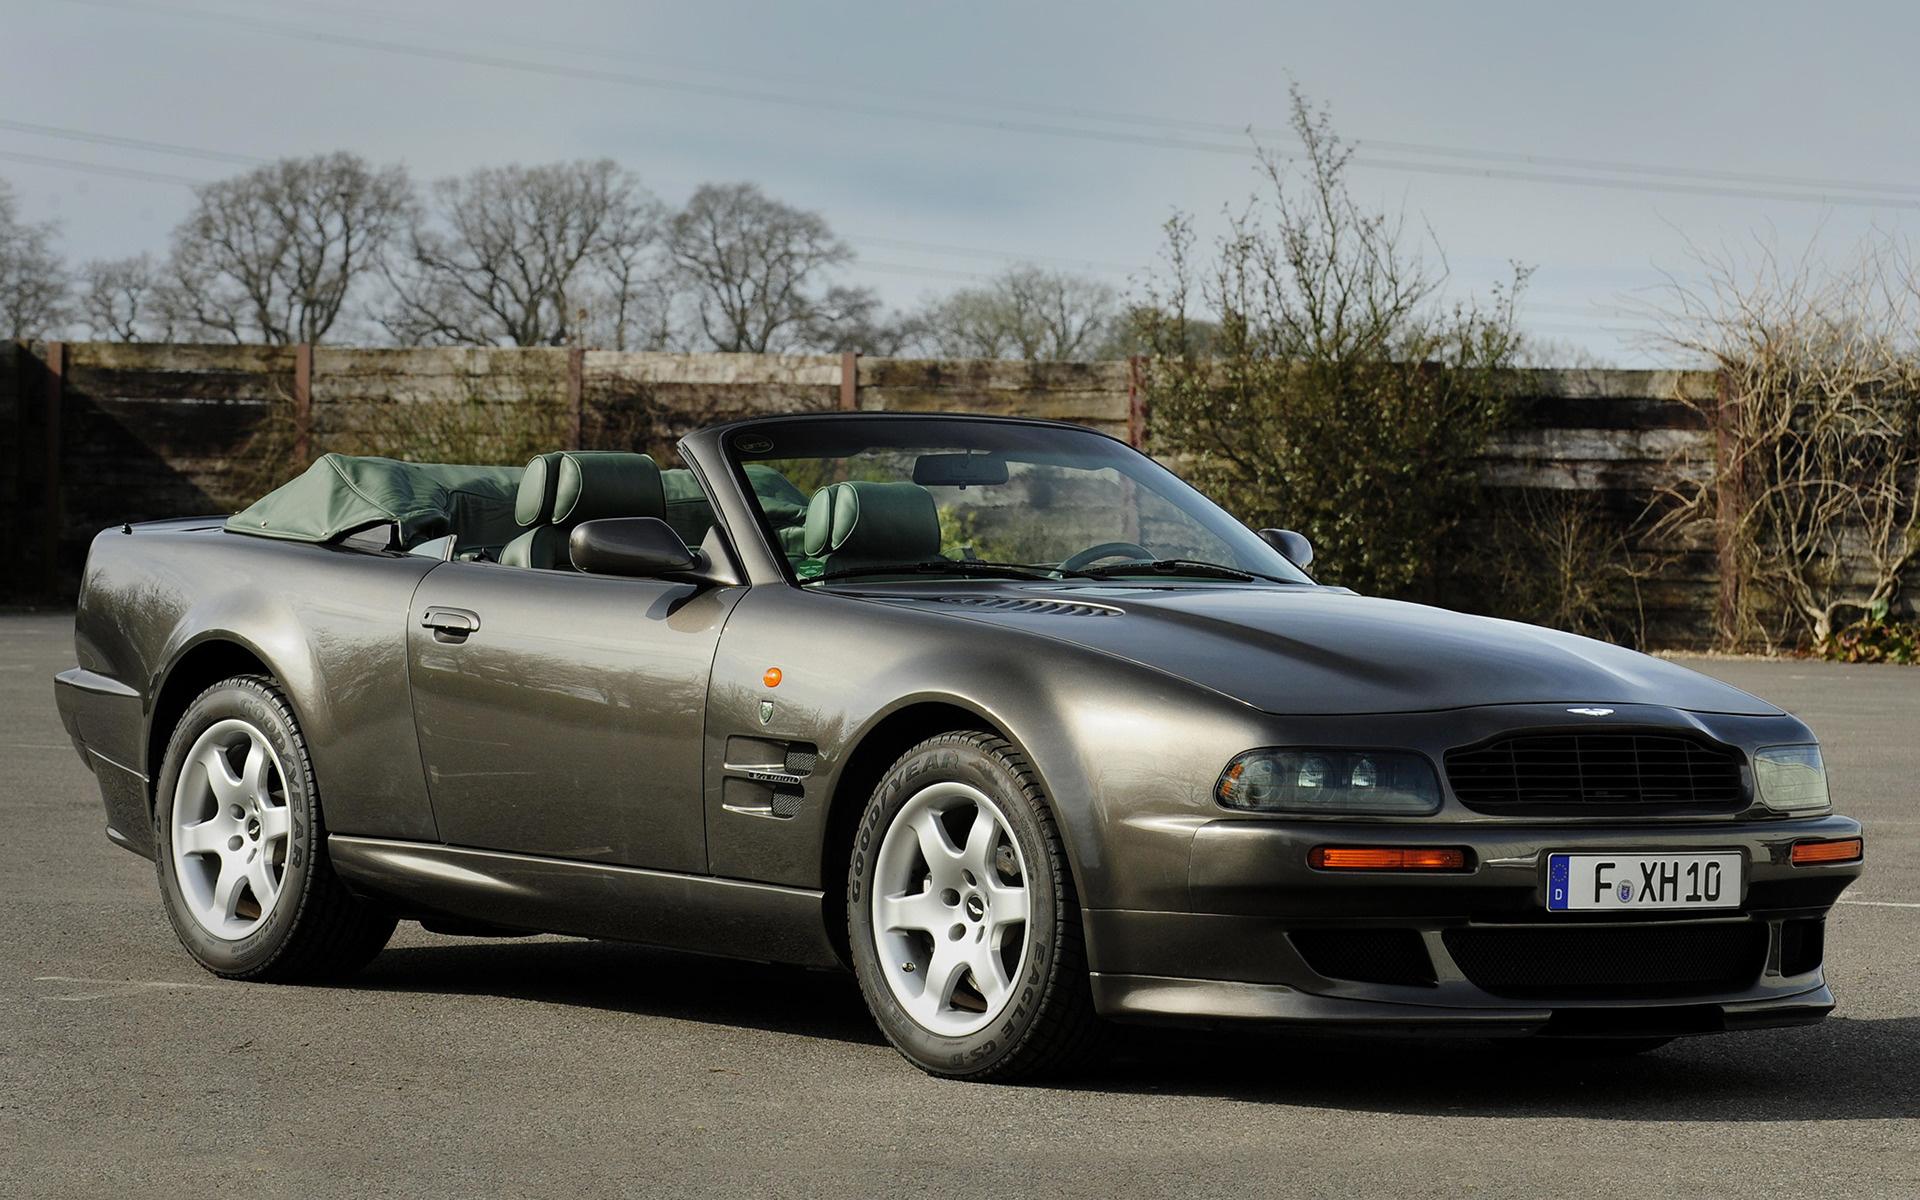 2000 Aston Martin V8 Vantage Volante Special Edition Hintergrundbilder Und Wallpaper In Hd Car Pixel